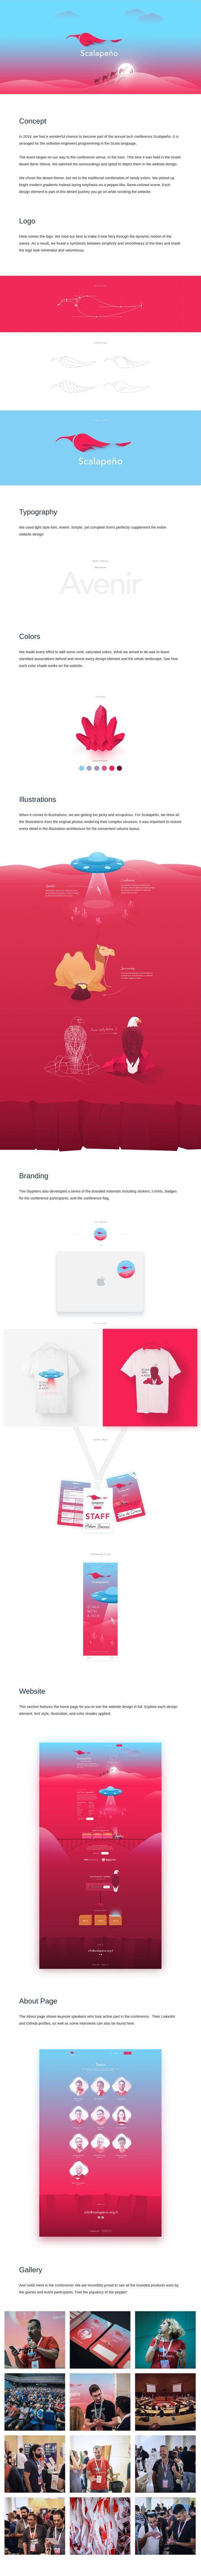 Scalapeno-web-design-inspiration-ui-ux-interfaces-branding-glyph-studio-agency-gallery-portfolio-fur